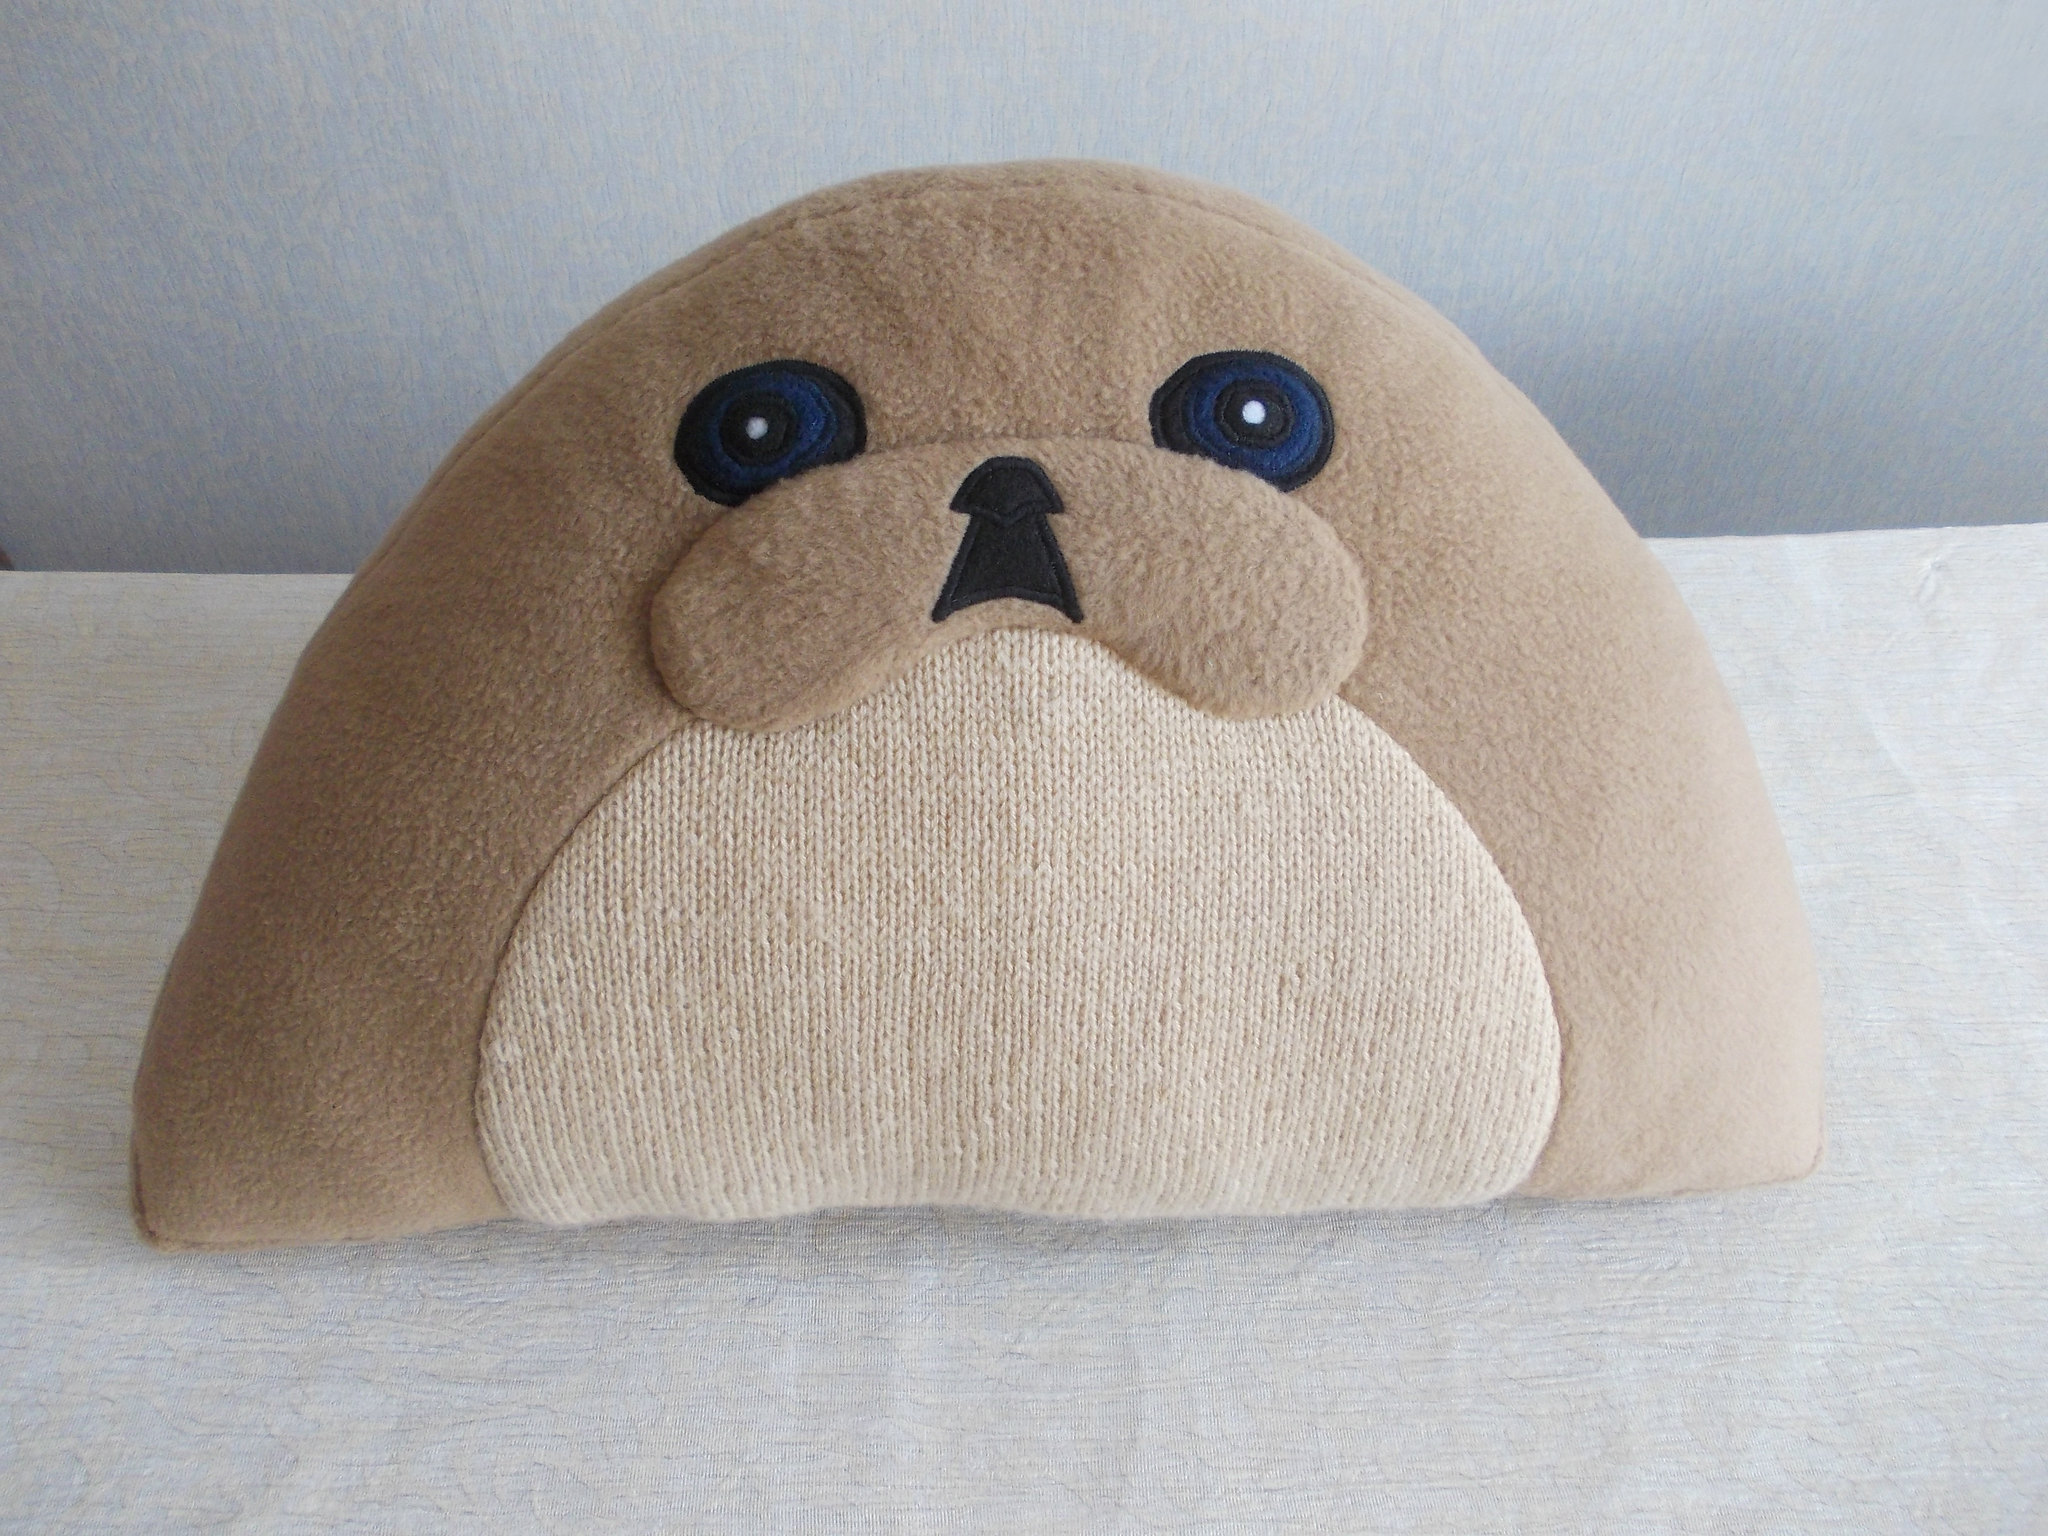 Pekingese, Pekingese pillow, dog shaped pillow, fleece and crochet pillow, two colored pekingese pillow 15